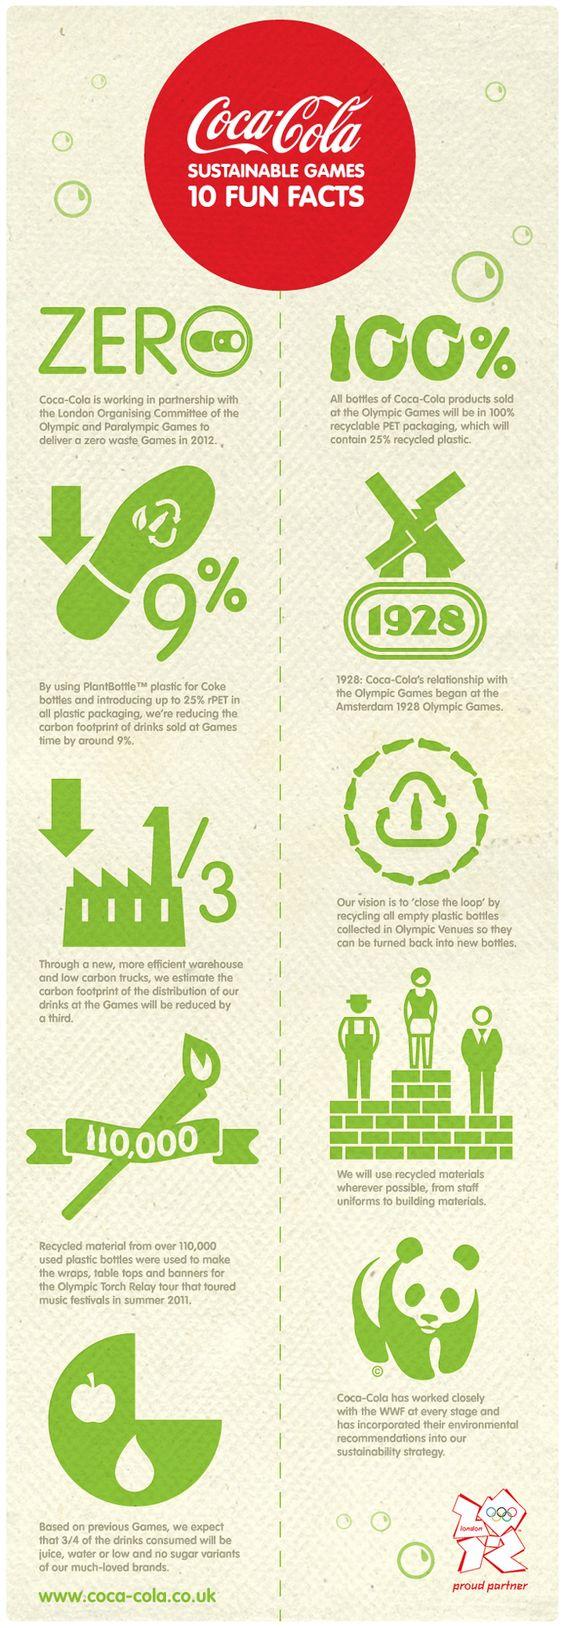 World Population Awareness